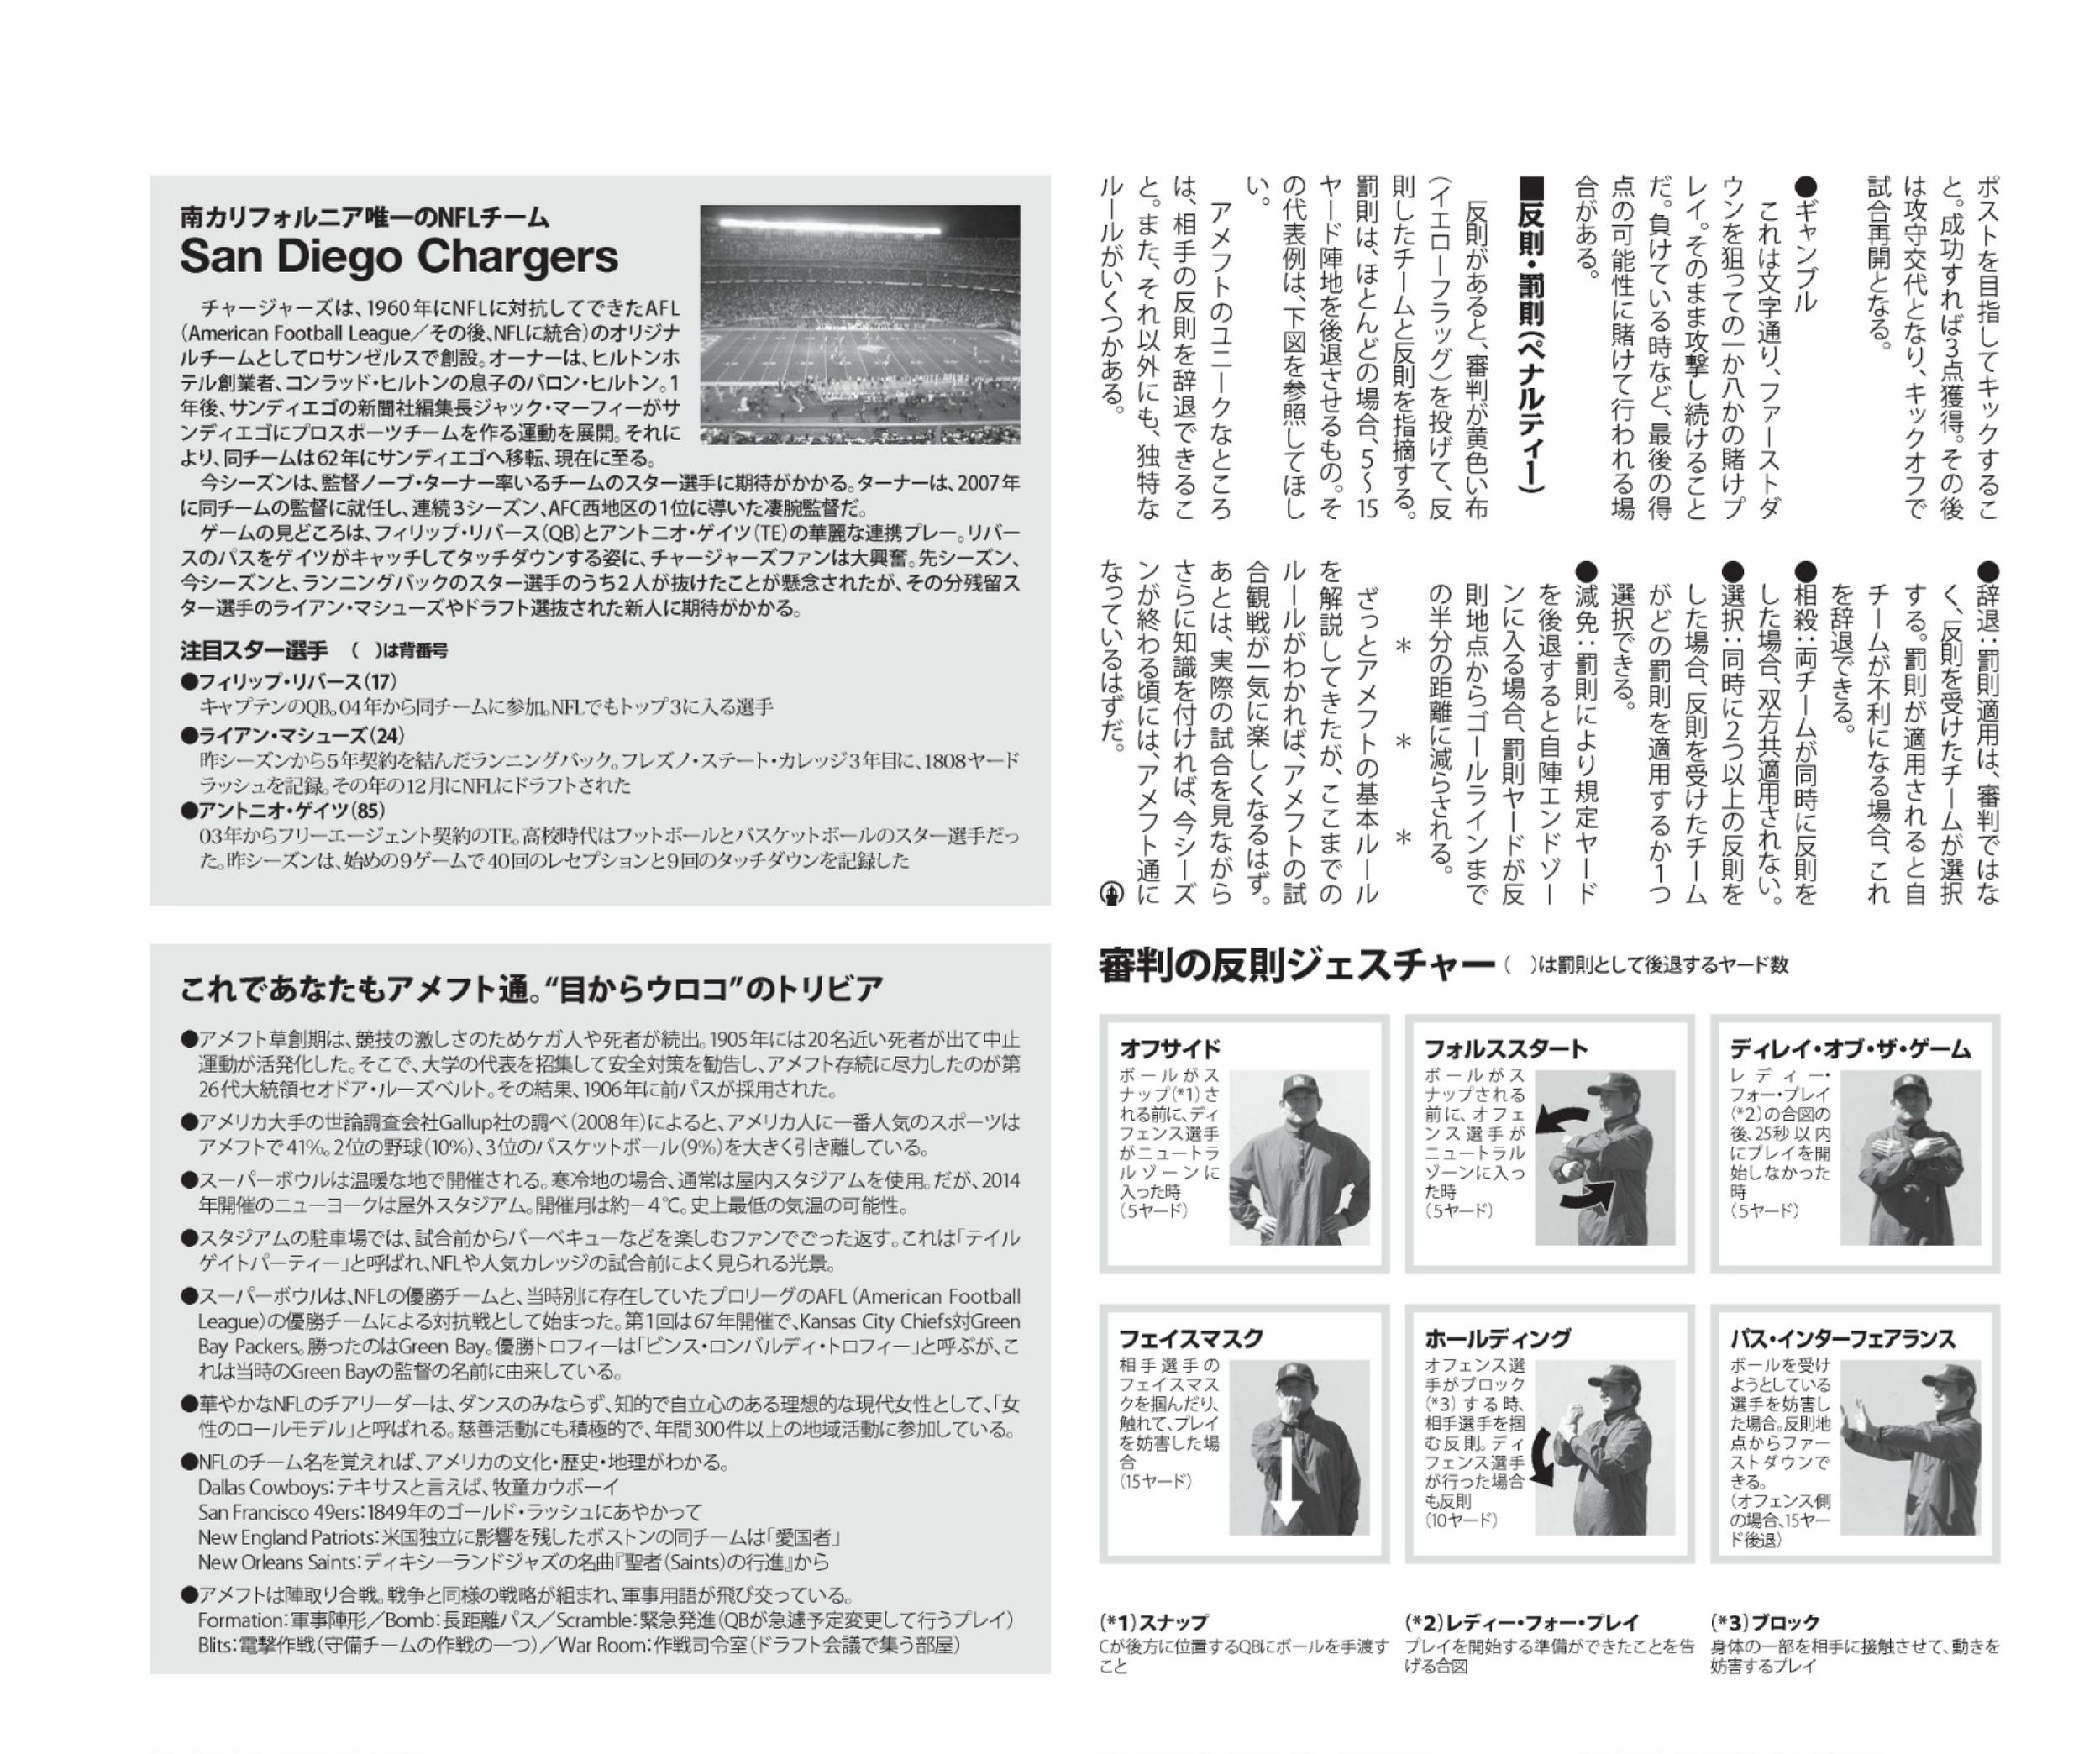 Lighthouse LA August 16, 2011 Page-1-3.jpg